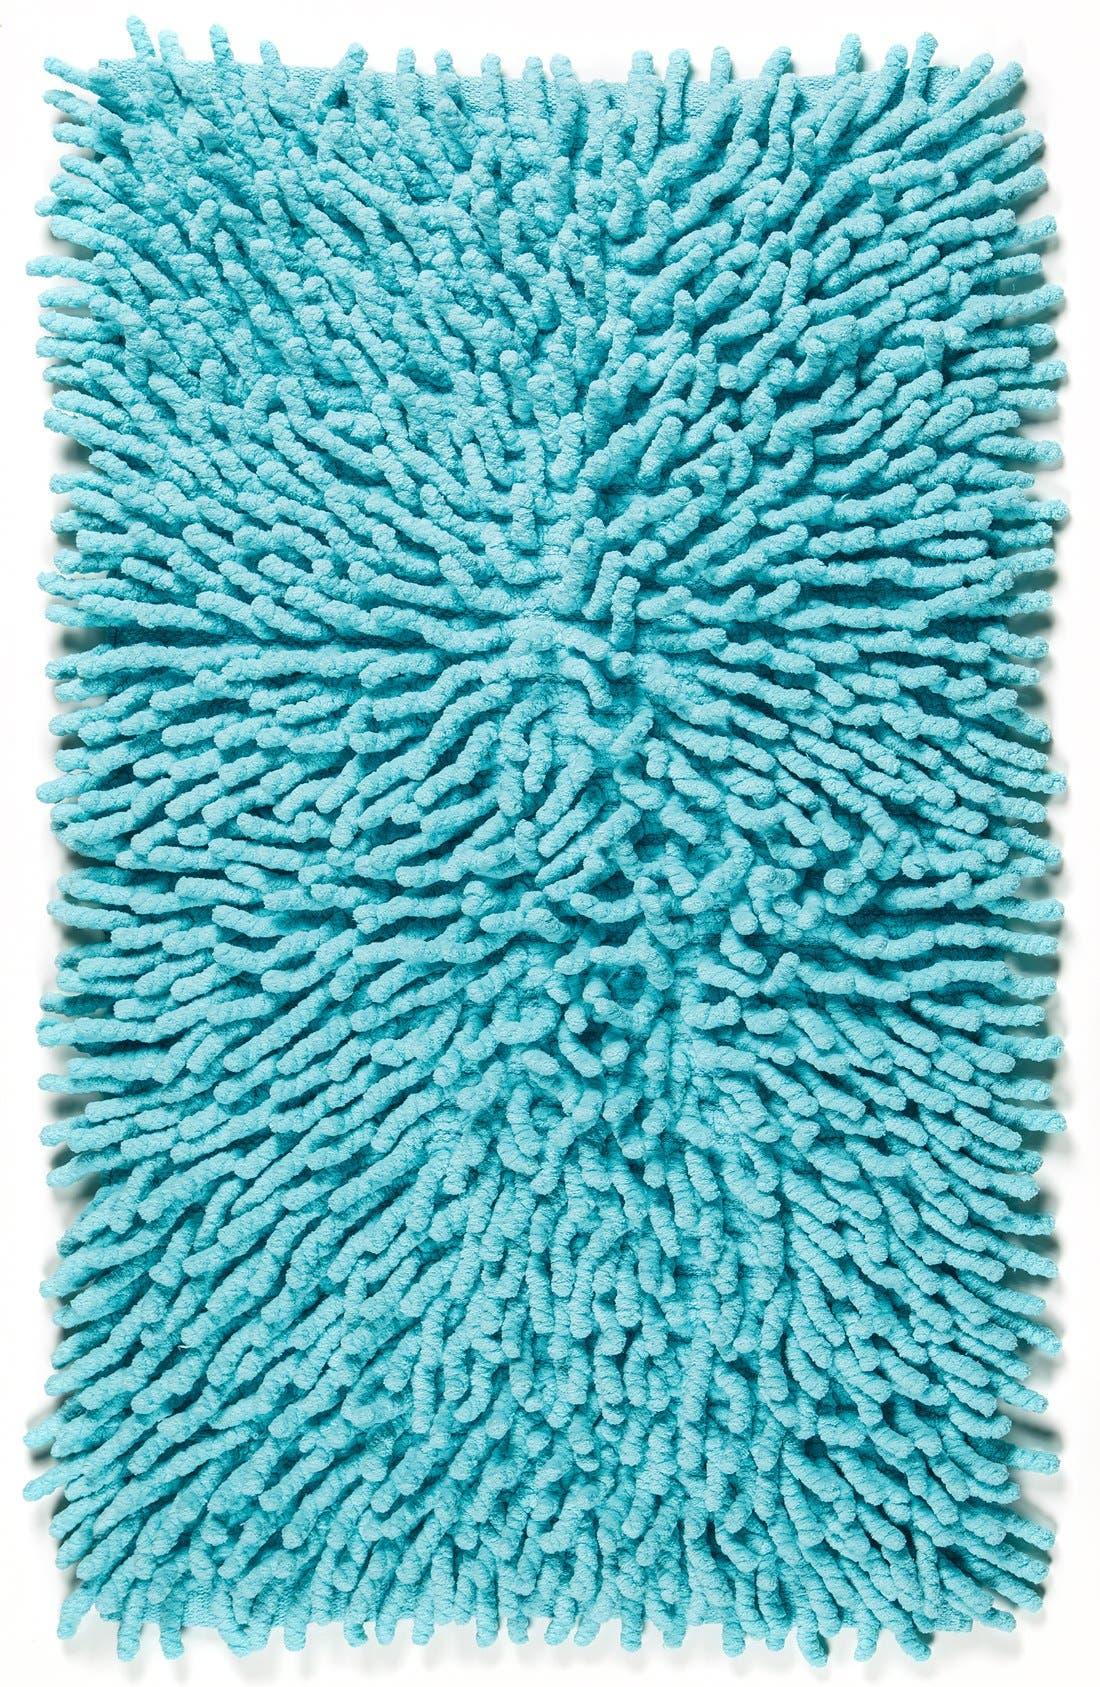 KASSATEX 'Bambini Basics' Shag Chenille Cotton Bath Rug